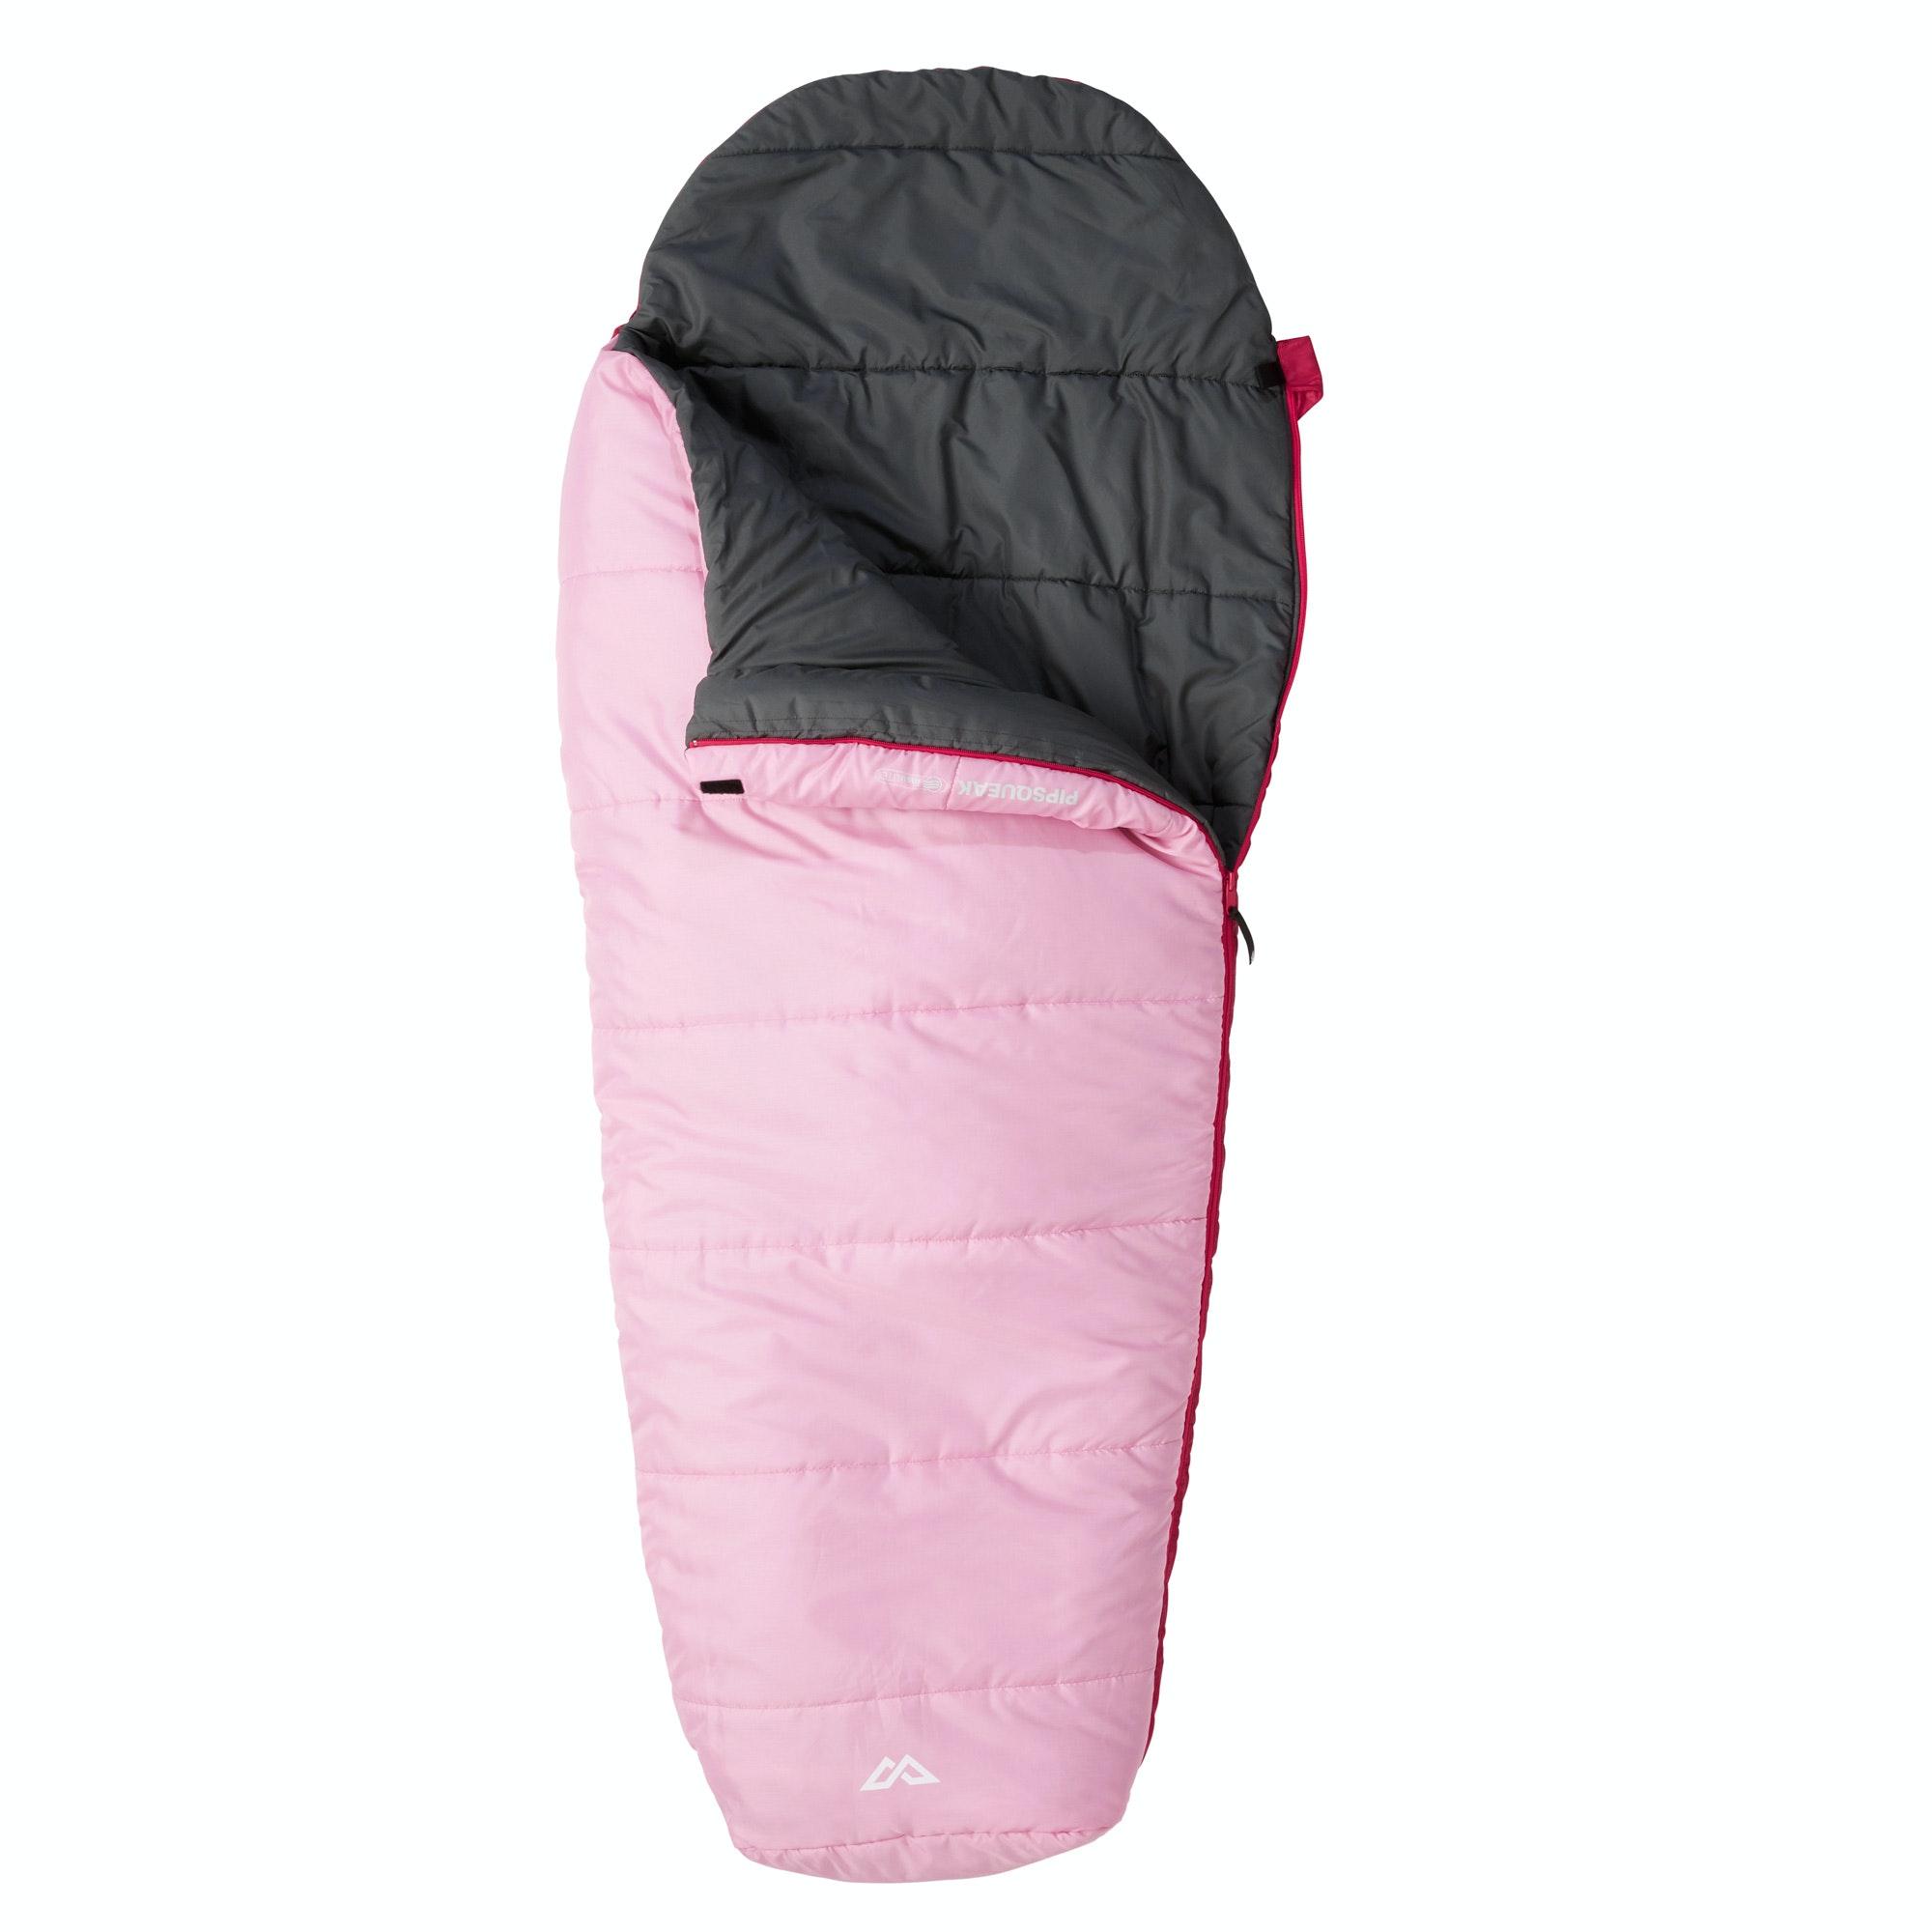 Pipsqueak Synthetic Sleeping Bag v5